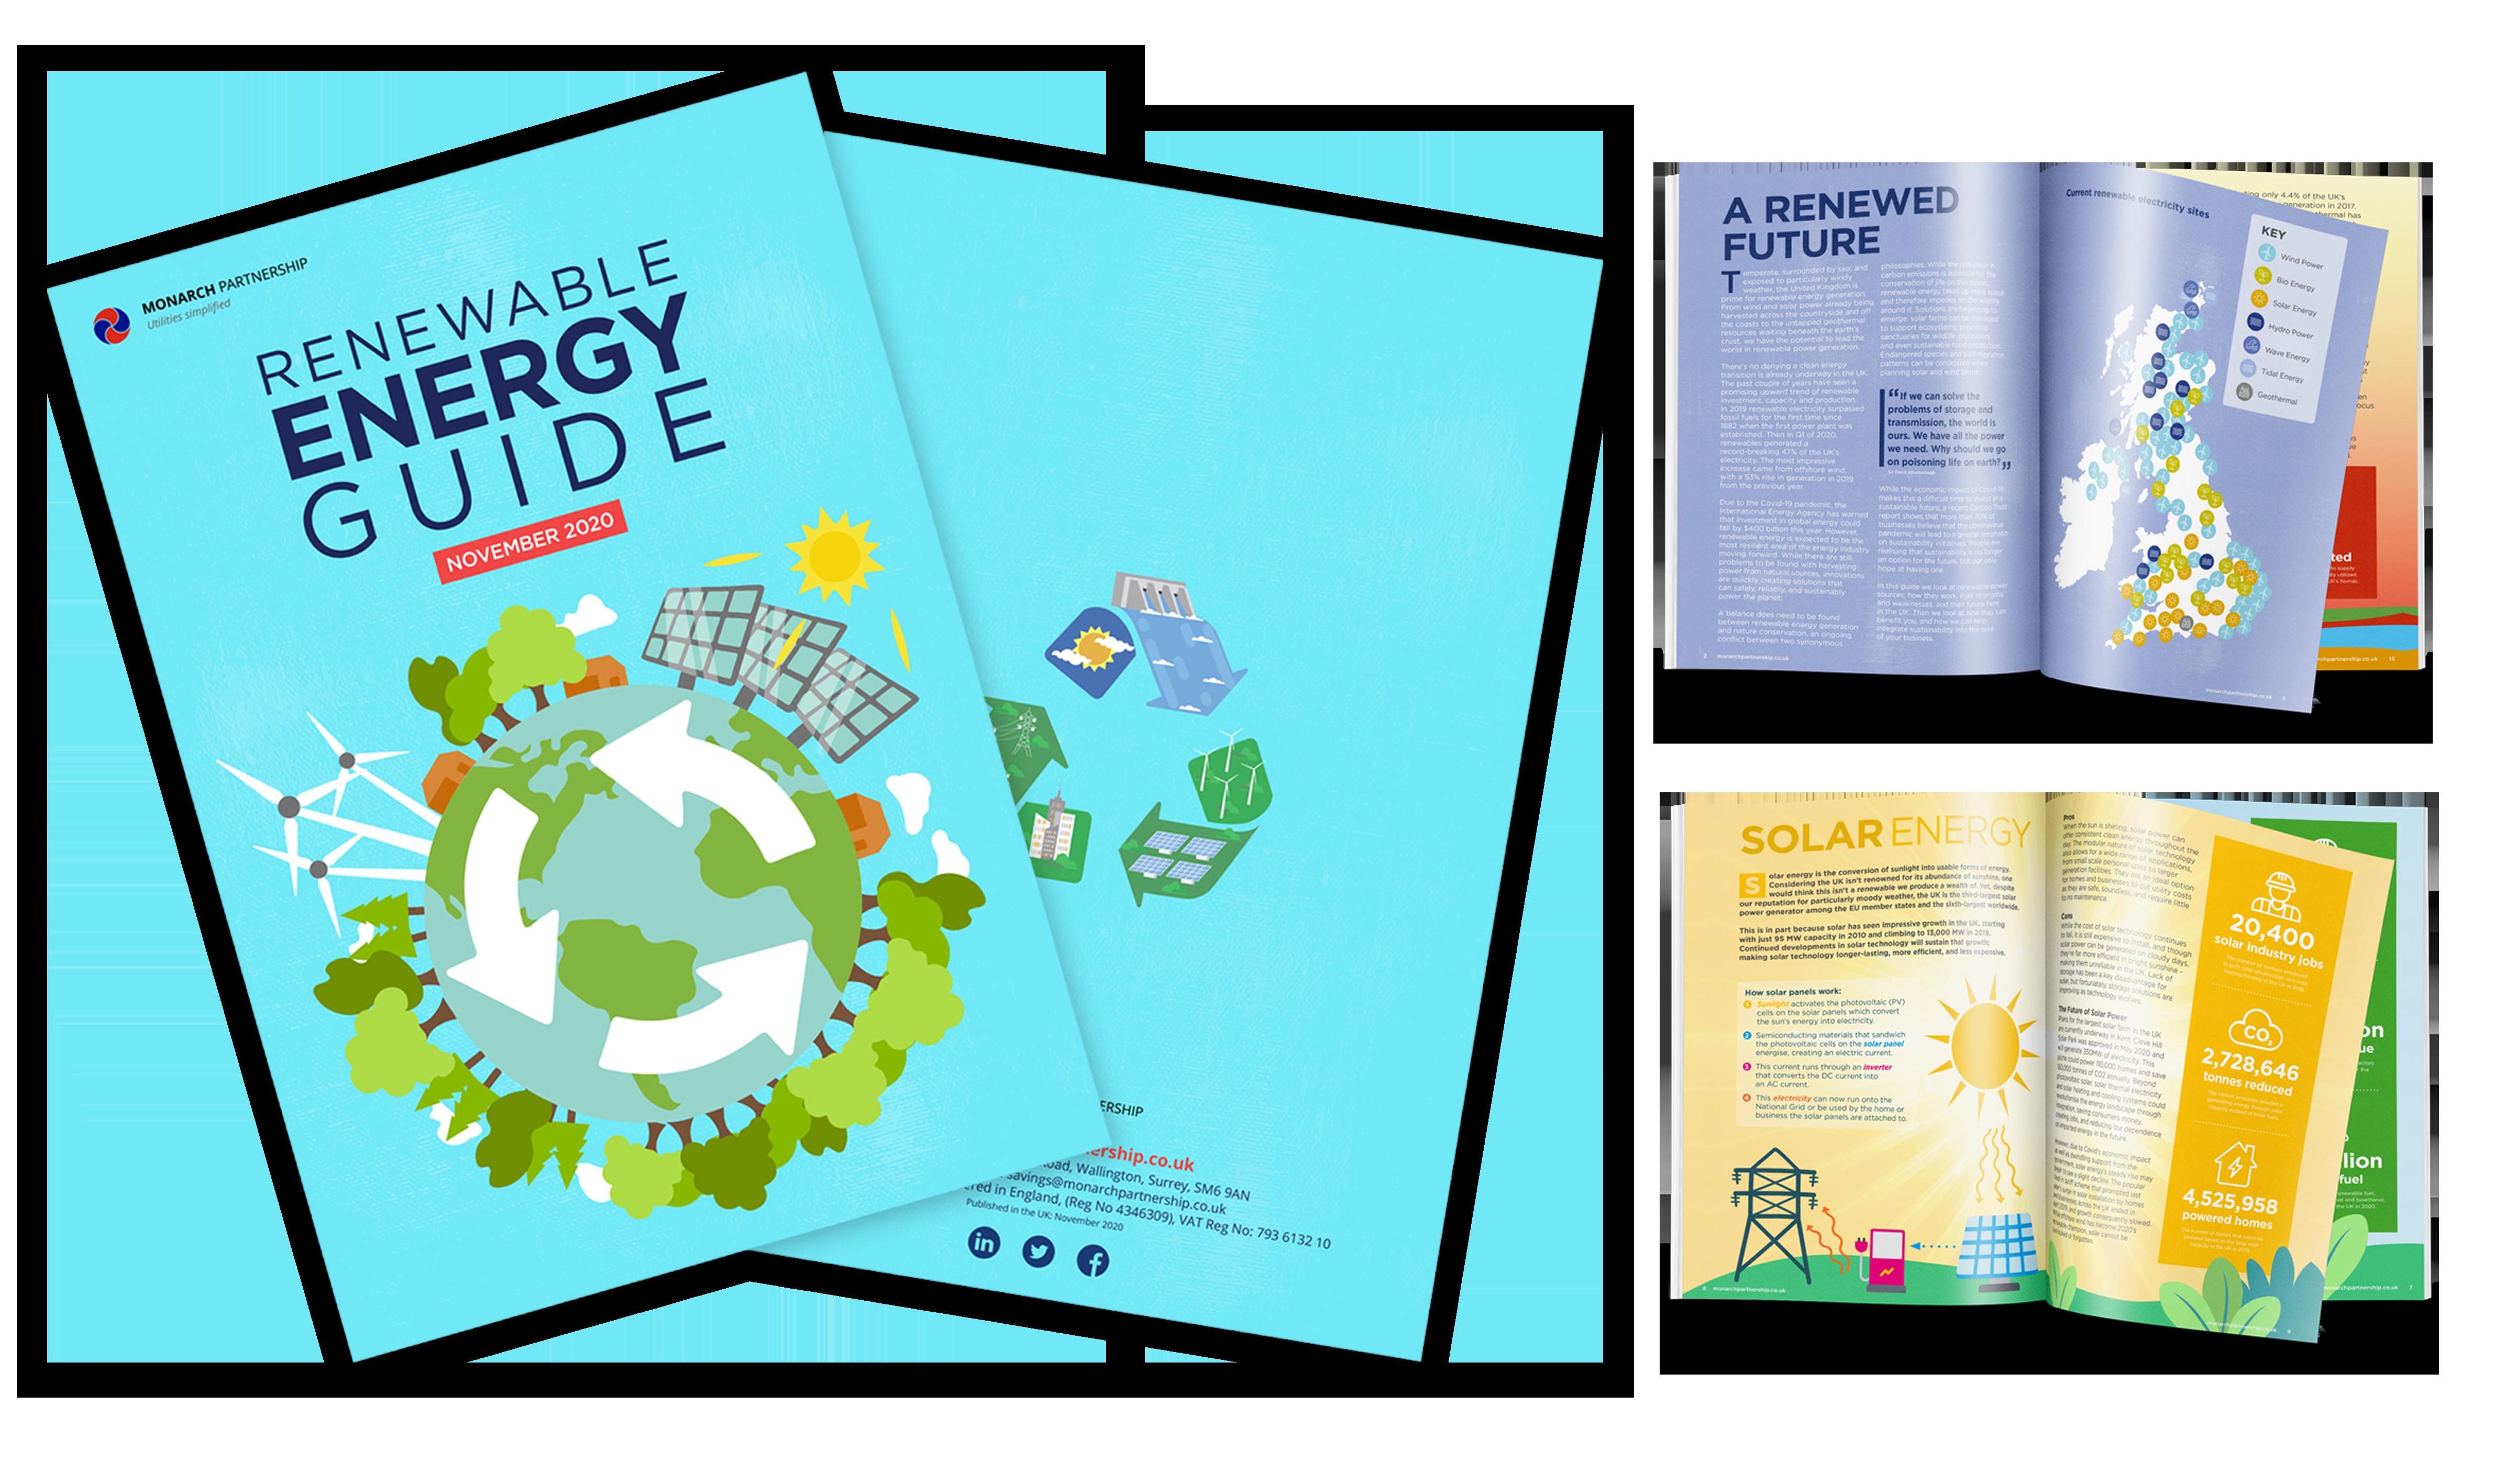 Renewable energy guide